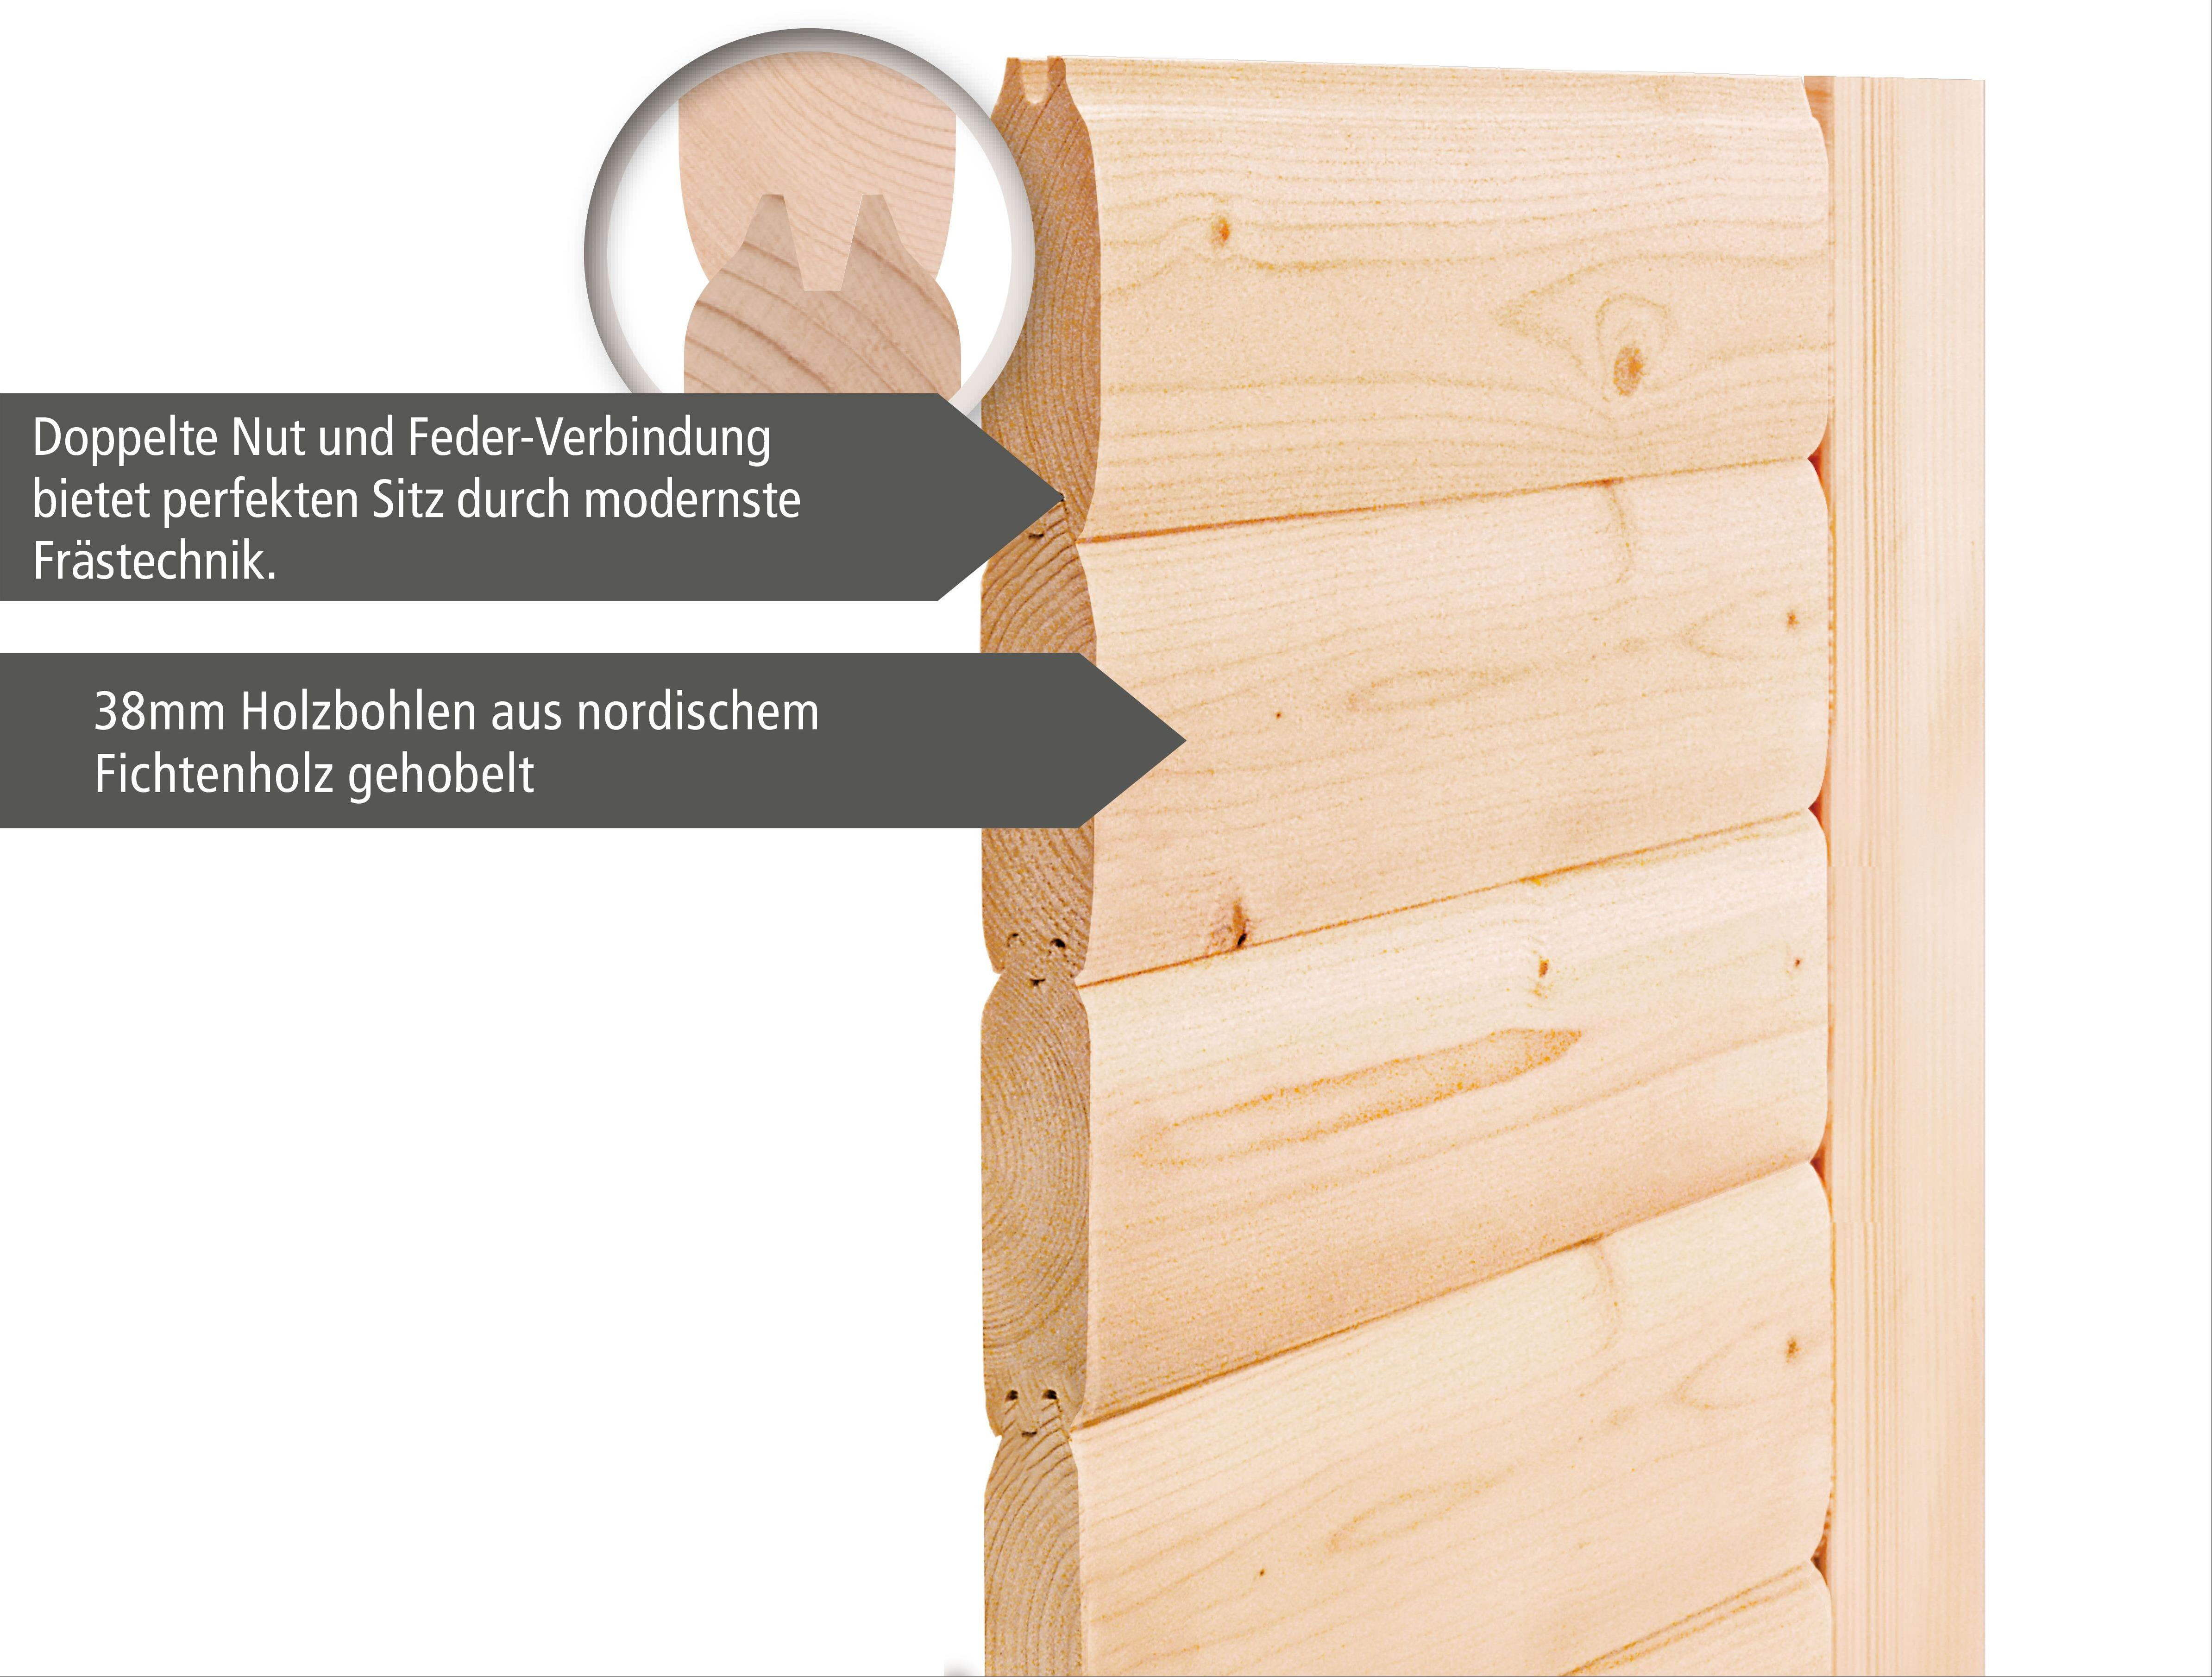 WoodFeeling Sauna Nina 38mm Saunaofen 9kW intern Holztür Bild 5